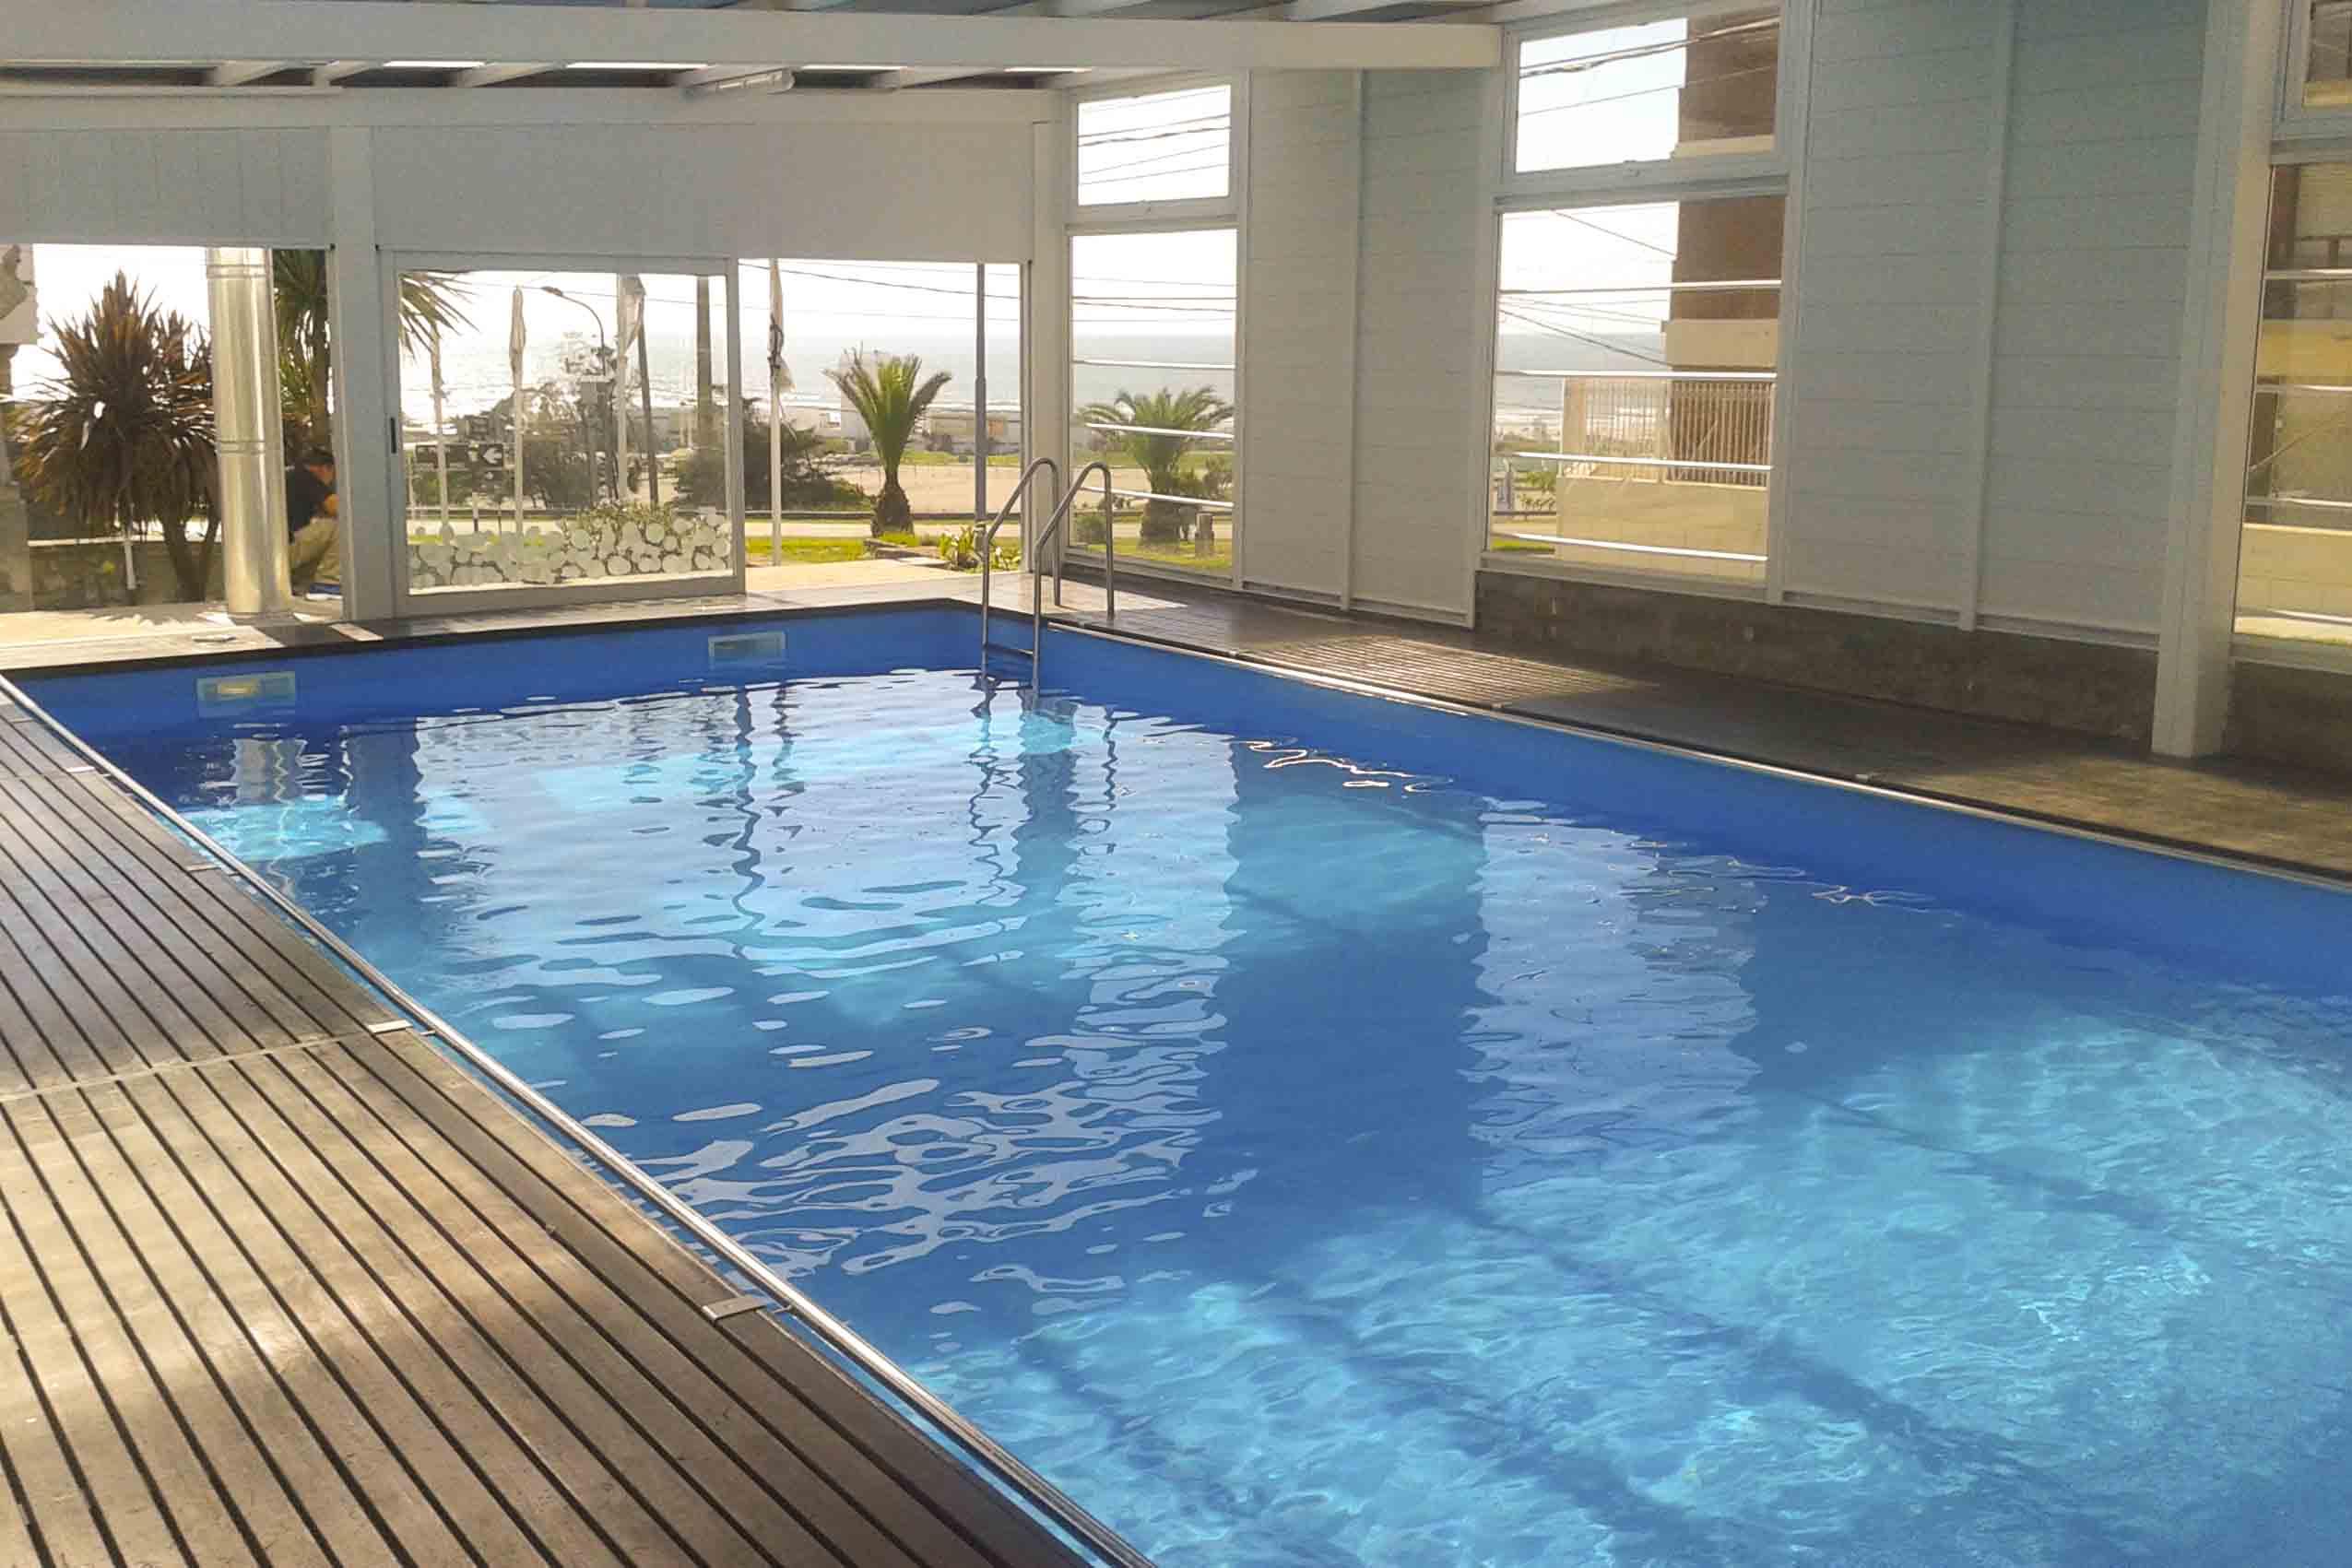 Grand hotel santa teresita mar del plata punta mogotes for Hoteles con piscinas naturales